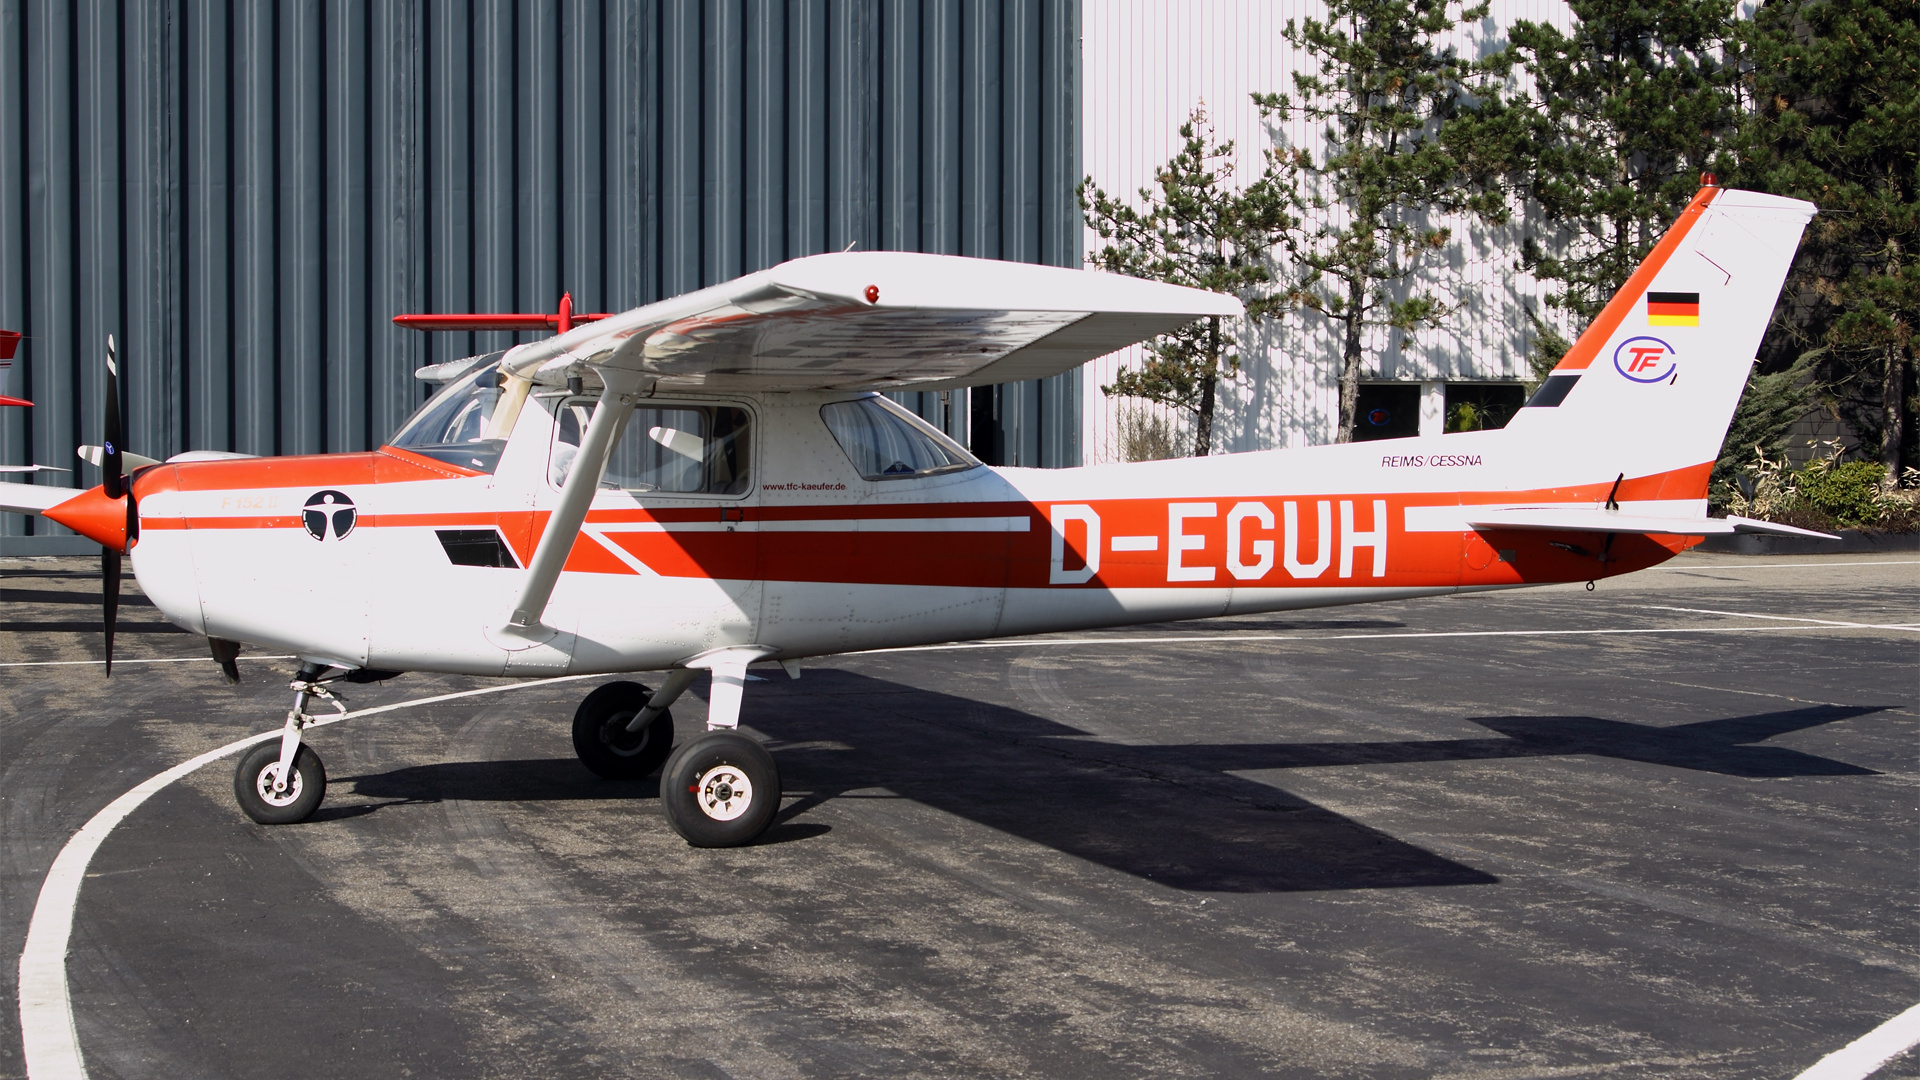 D-EGUH-1 C152 ESS 201003